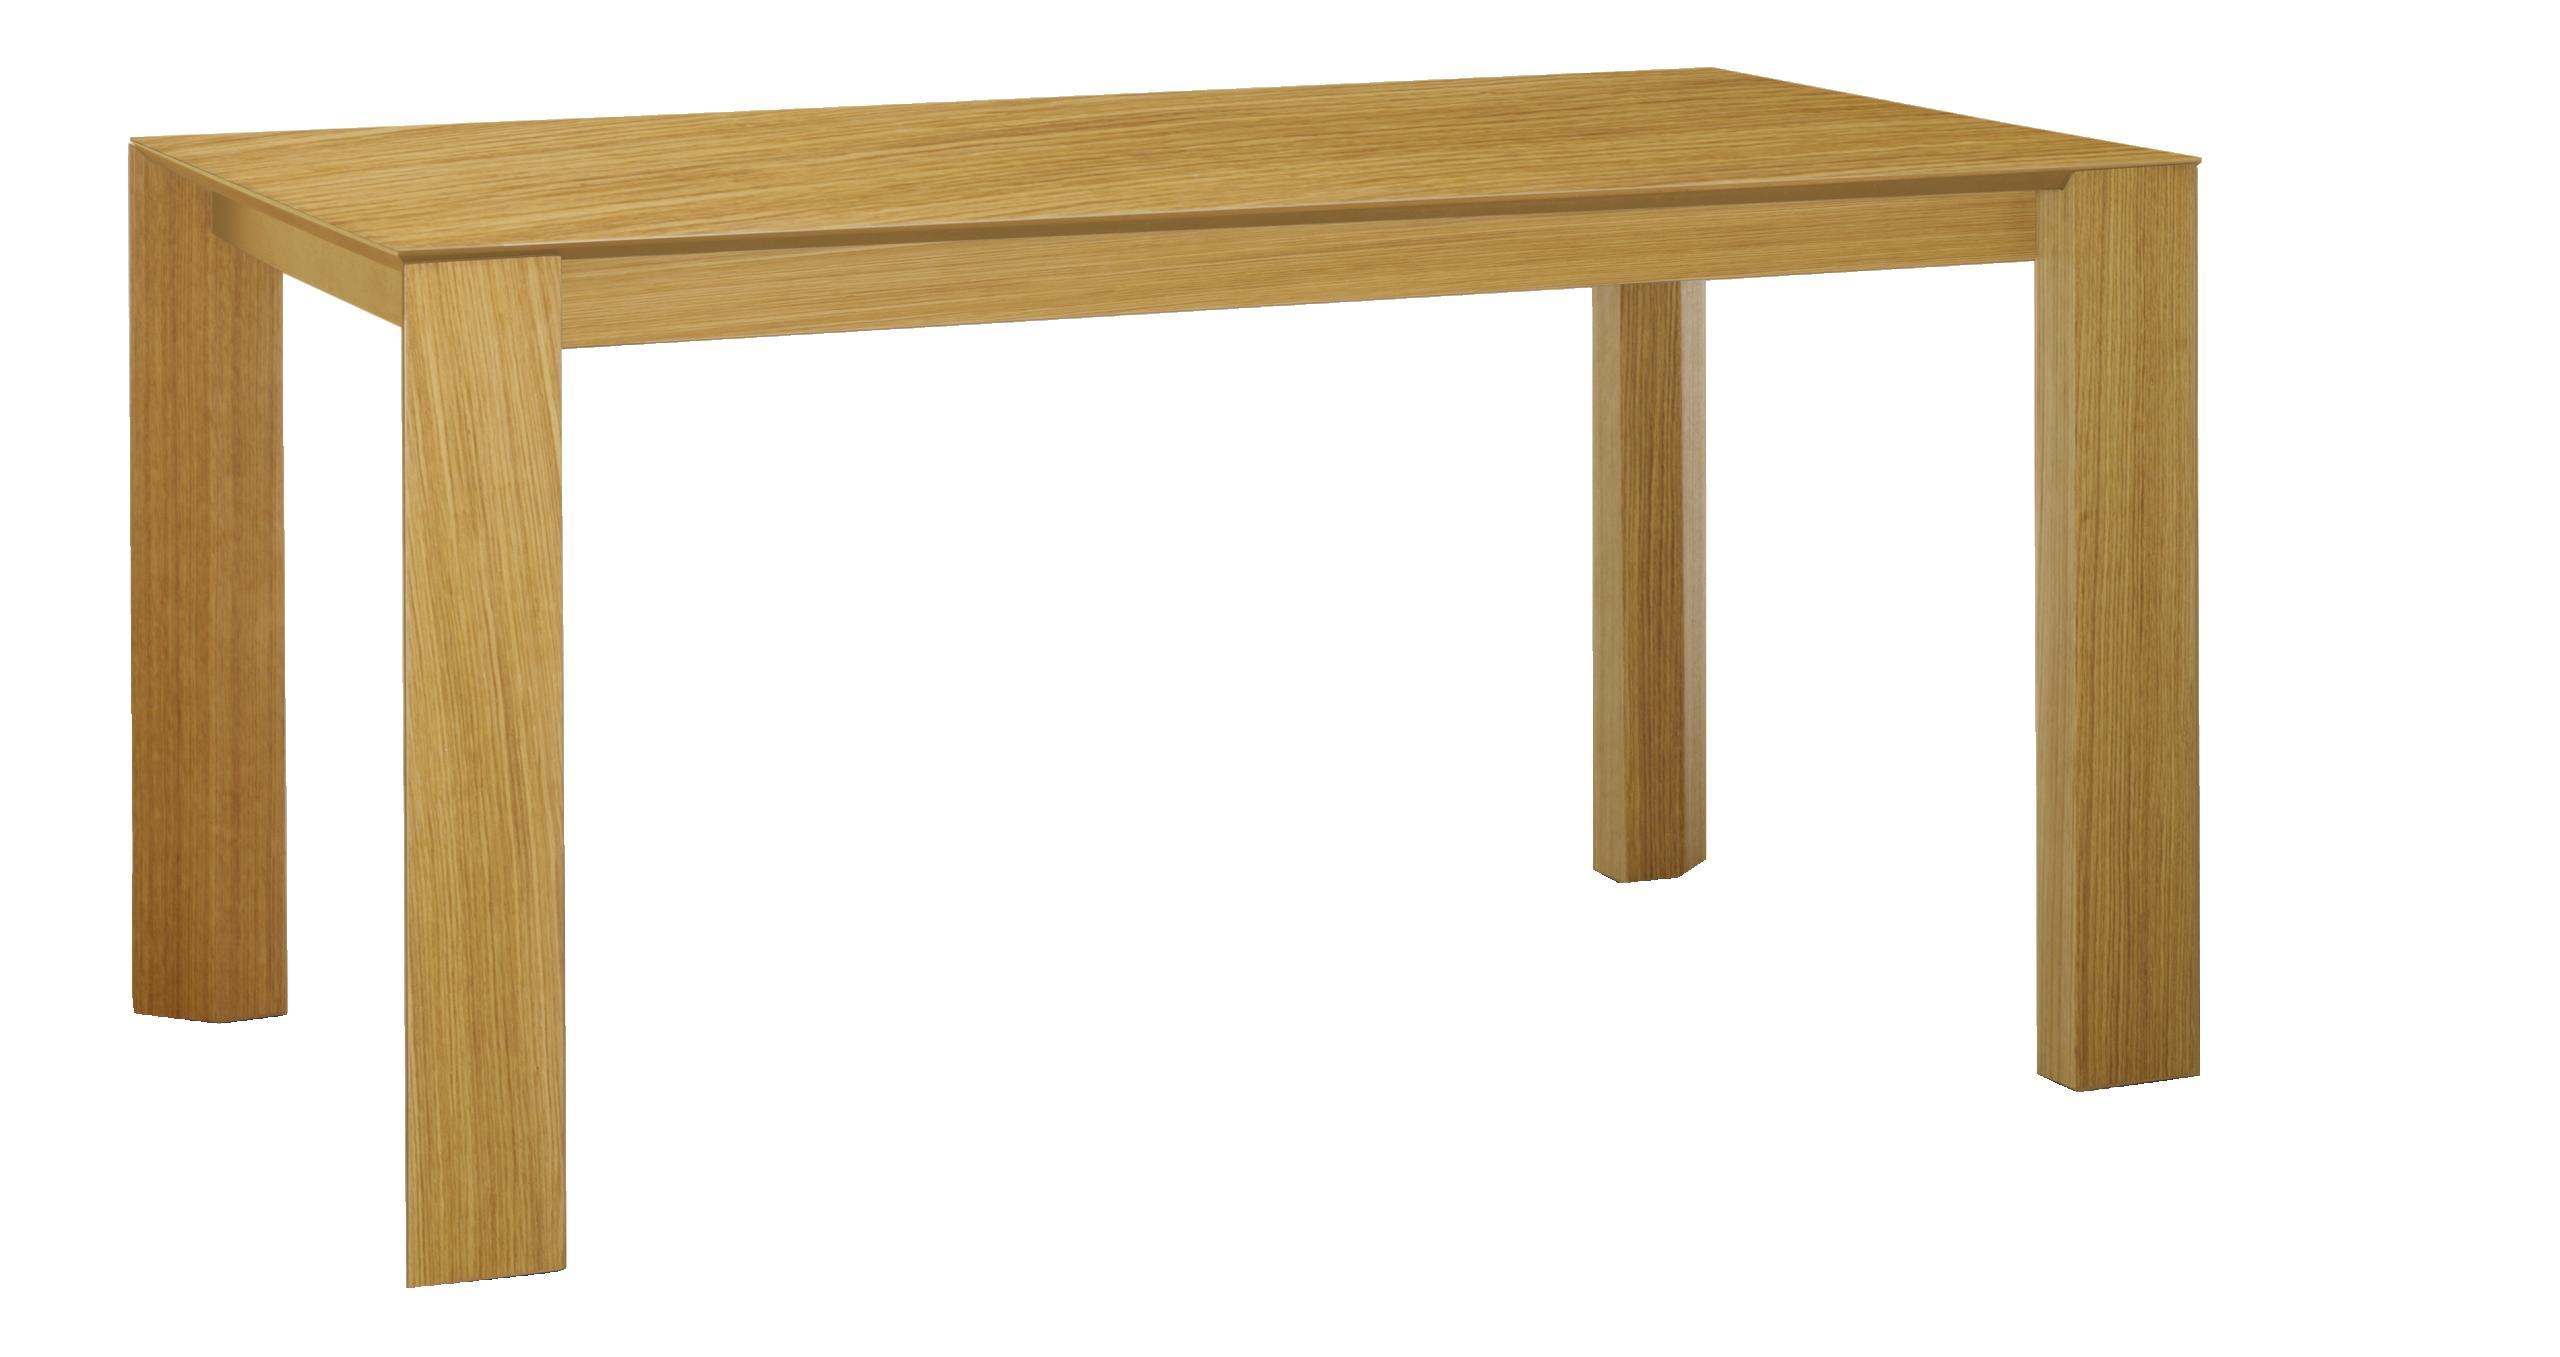 215306a0c2a47bb0ede347cb36c5ddb6 Impressionnant De Table Gigogne Ikea Concept